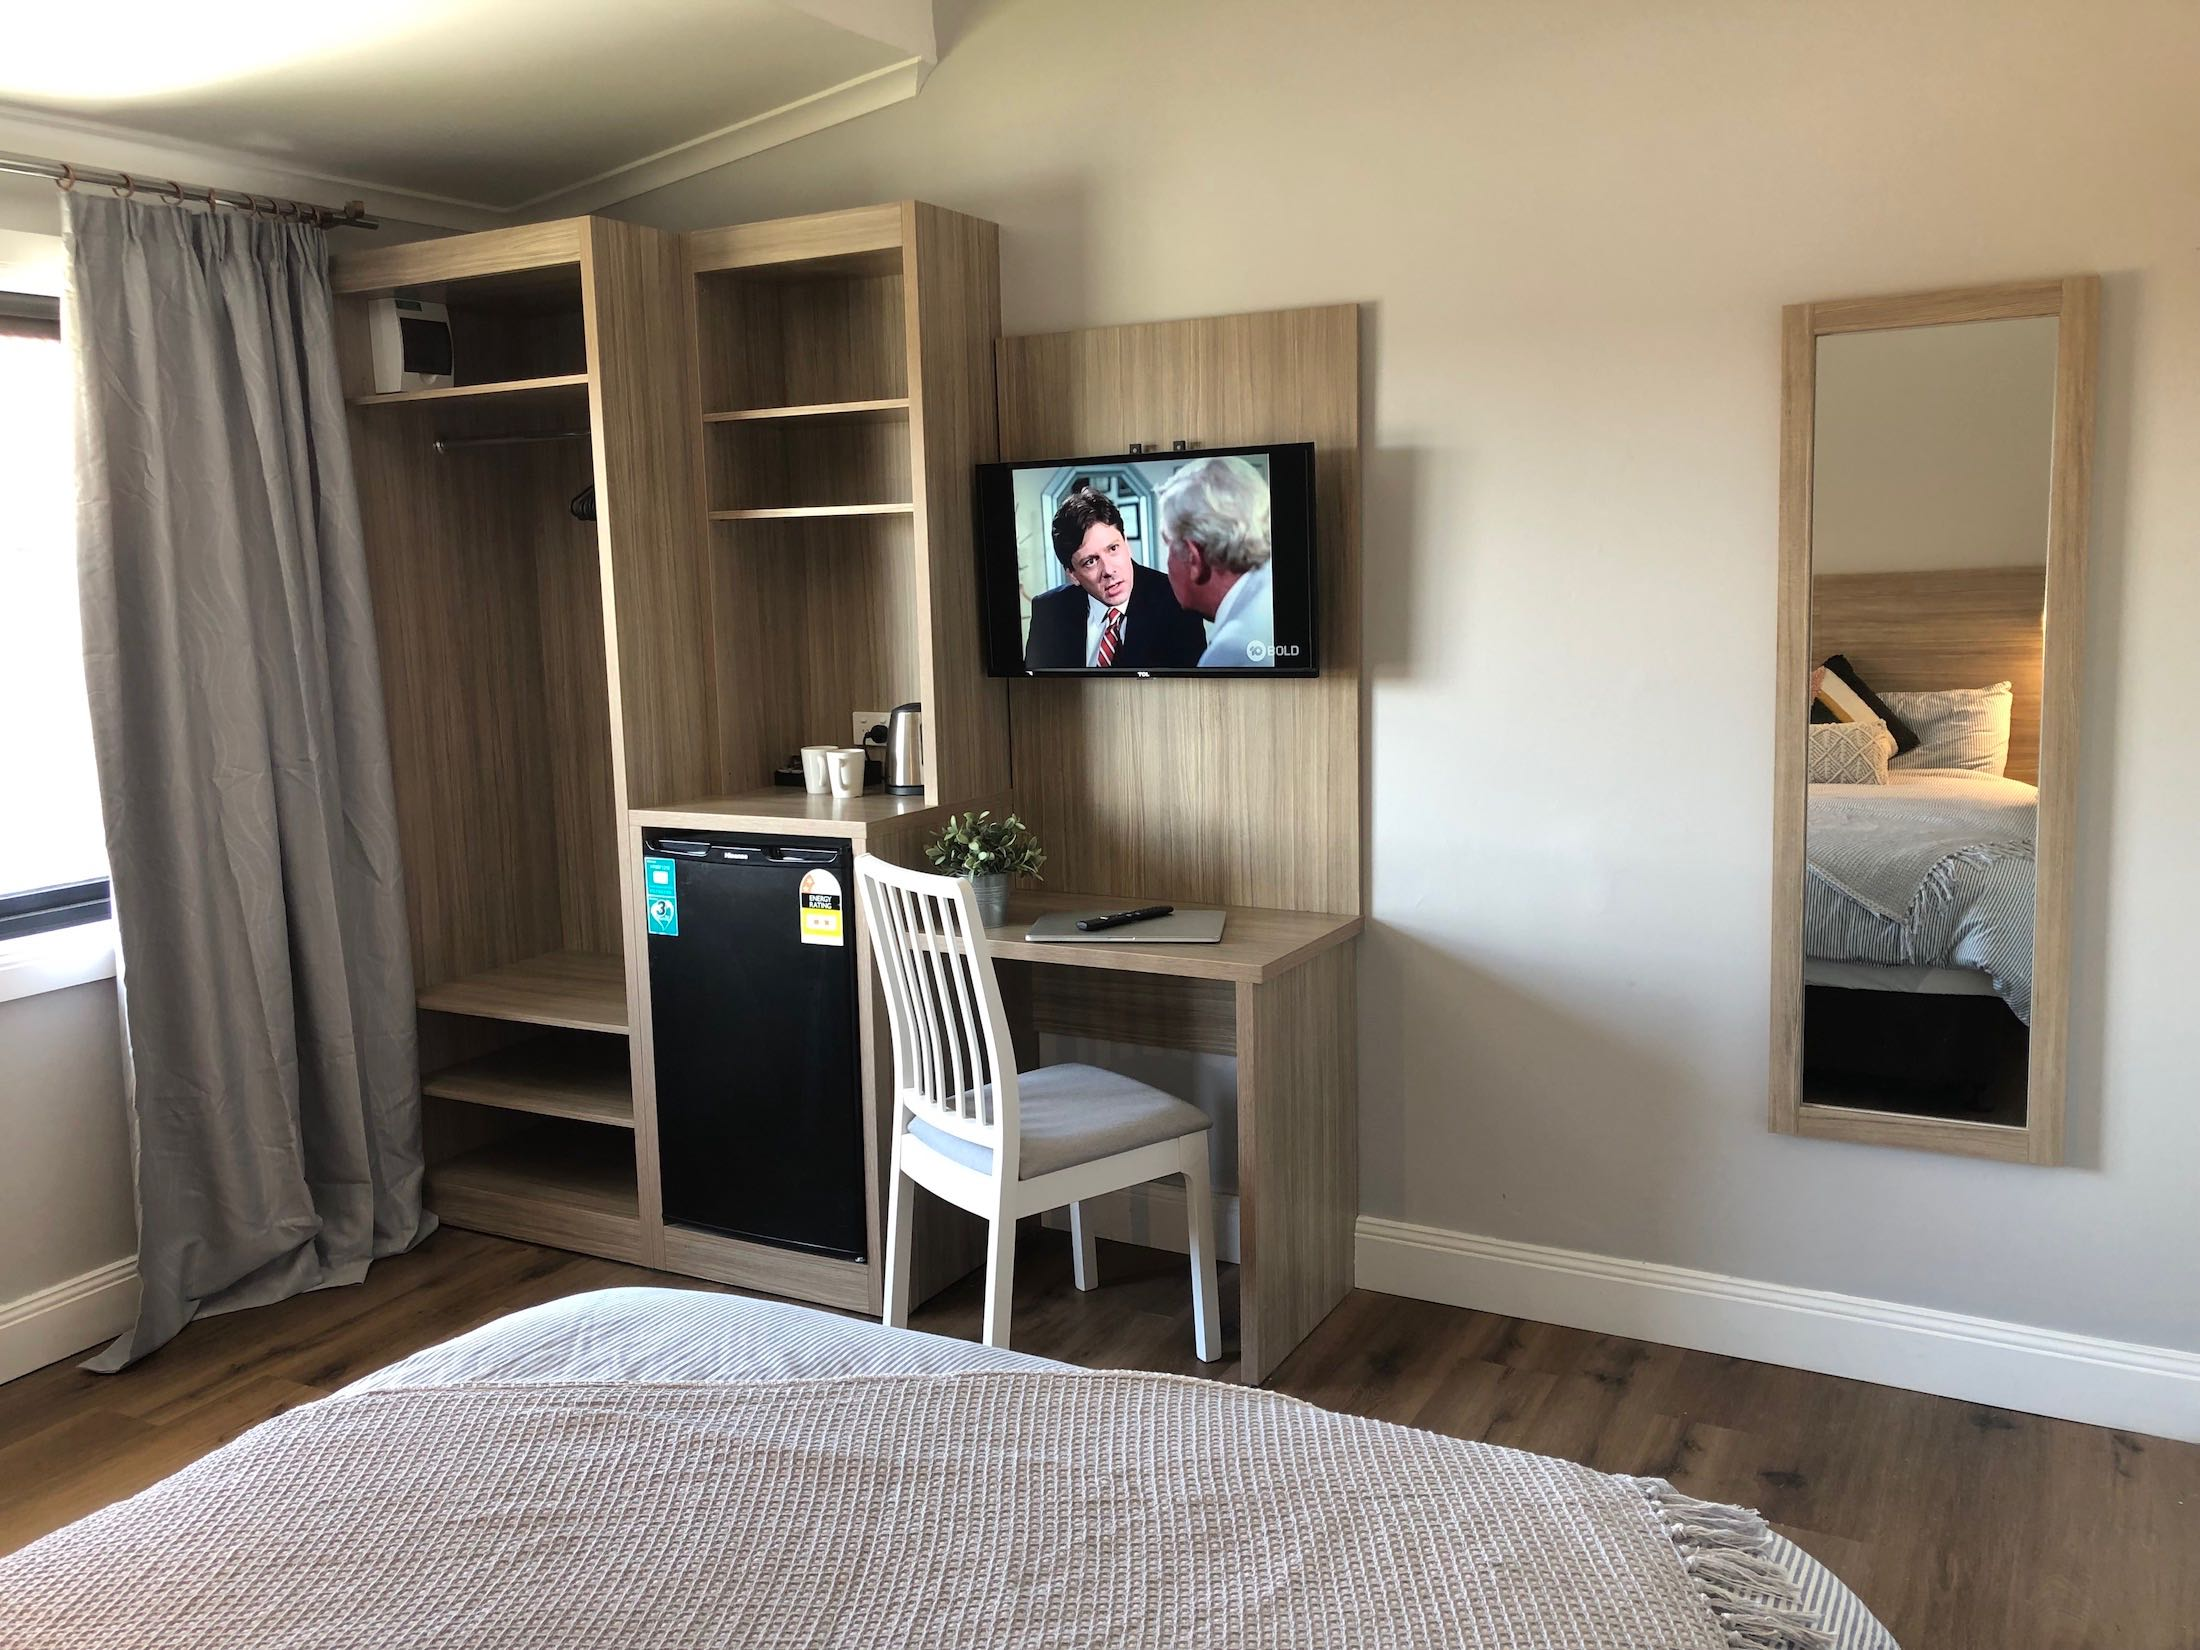 carnarvon-lodge-kirribilli-sydney-accommodation-double-room14